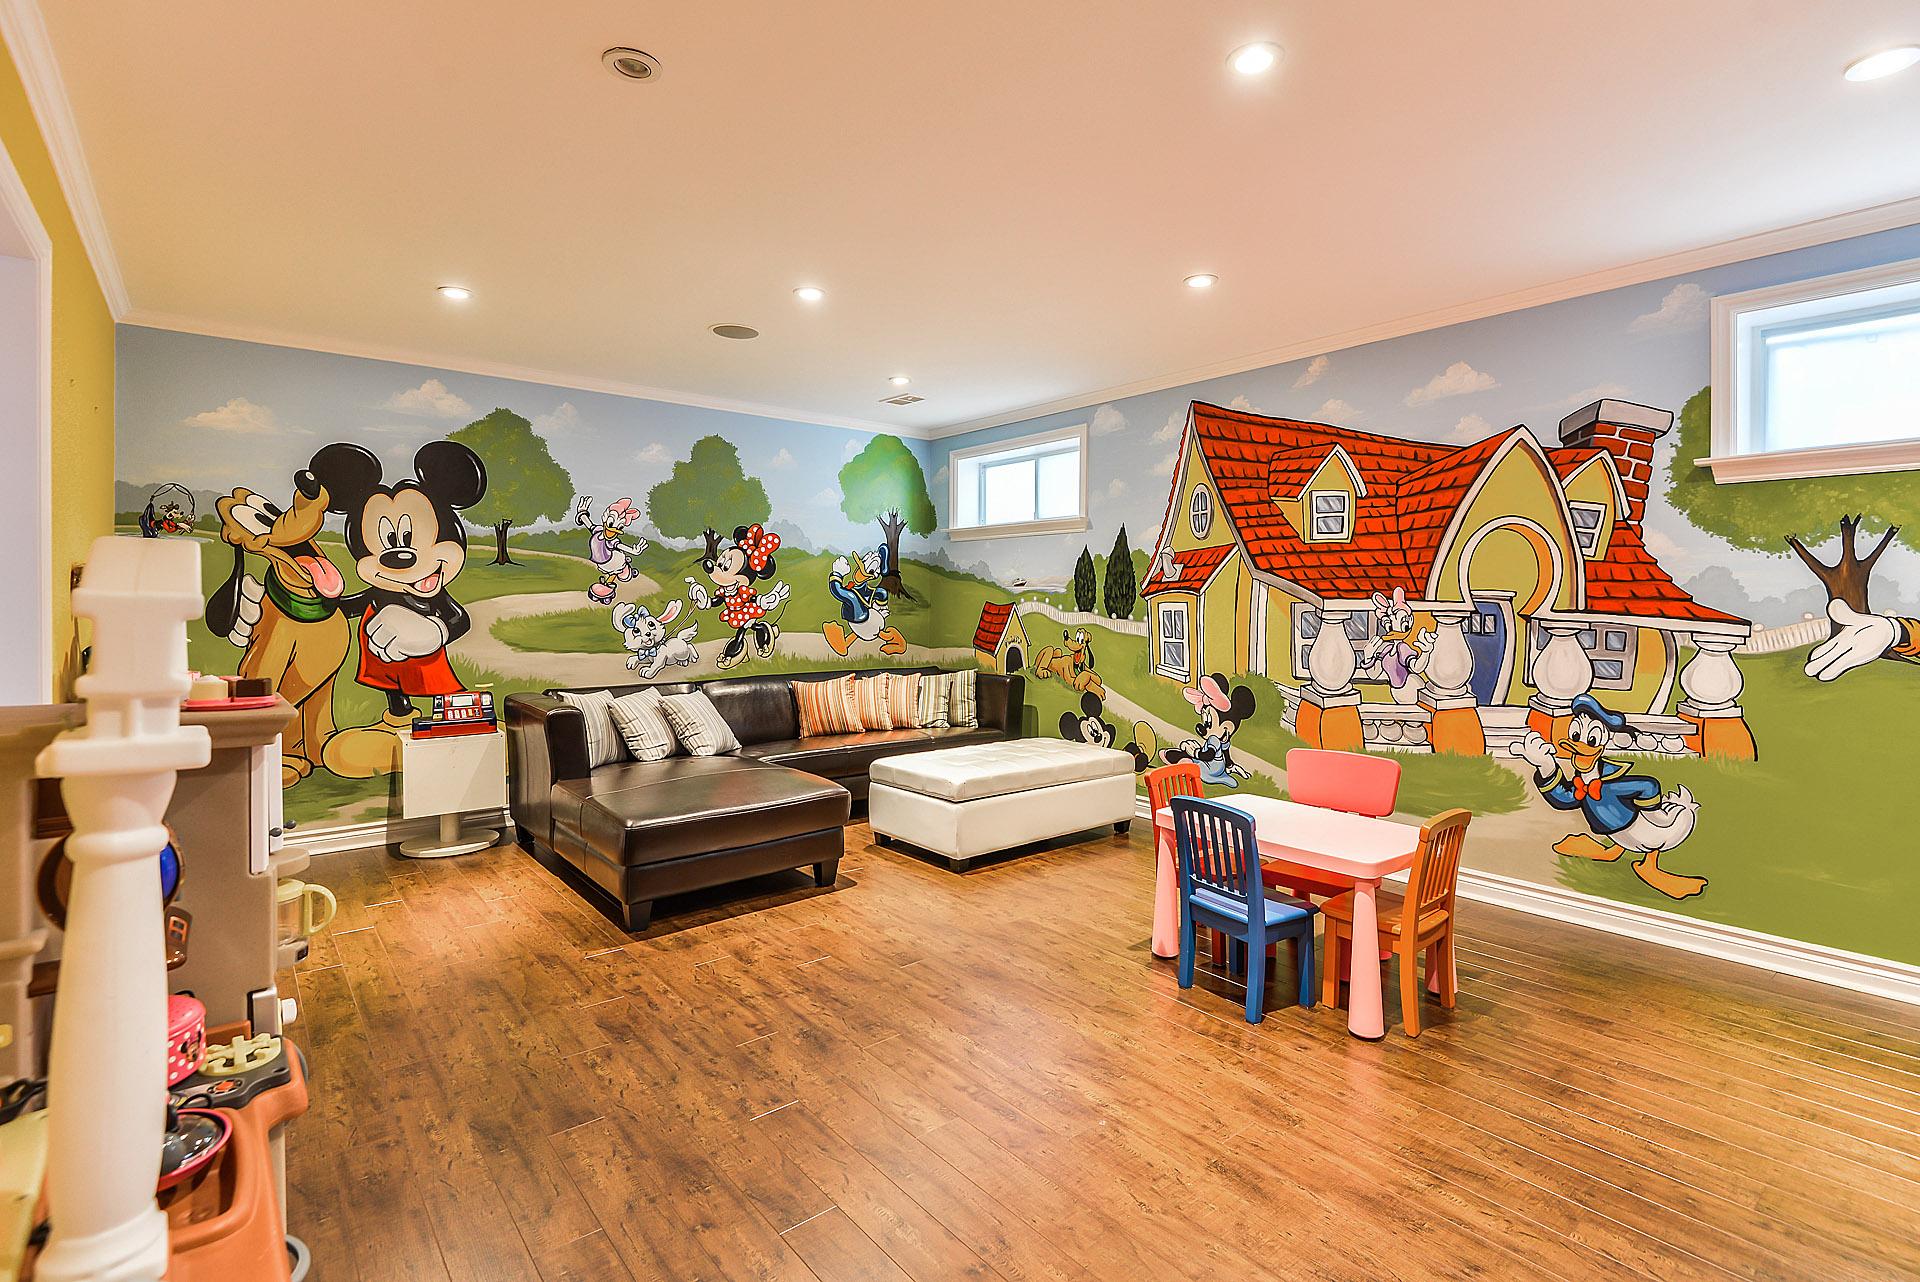 Murals By Marg Mickey Playroom 2.JPG